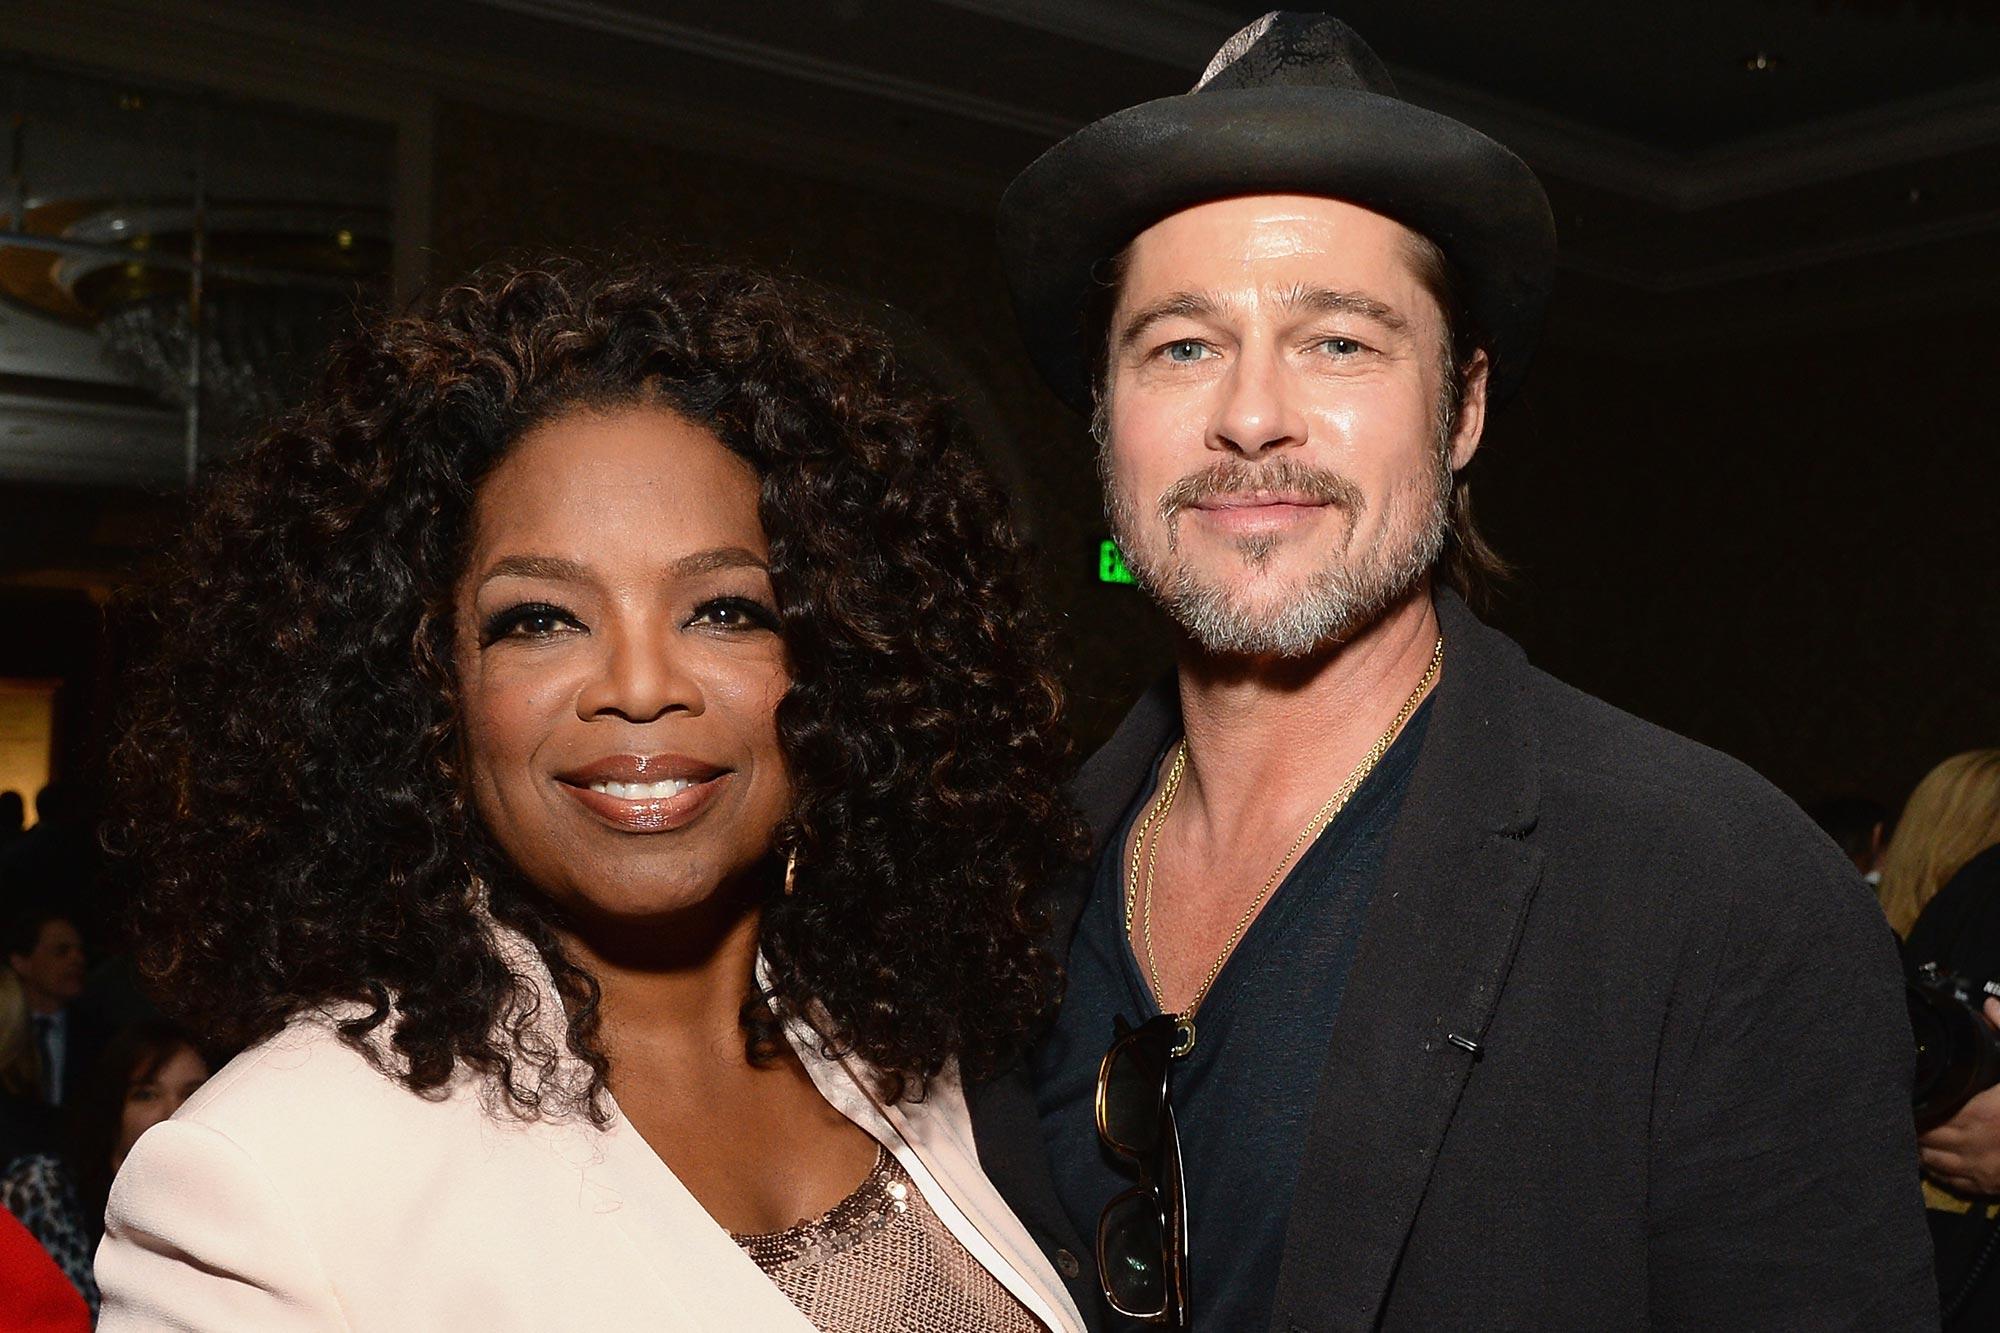 Oprah Winfrey and Brad Pitt